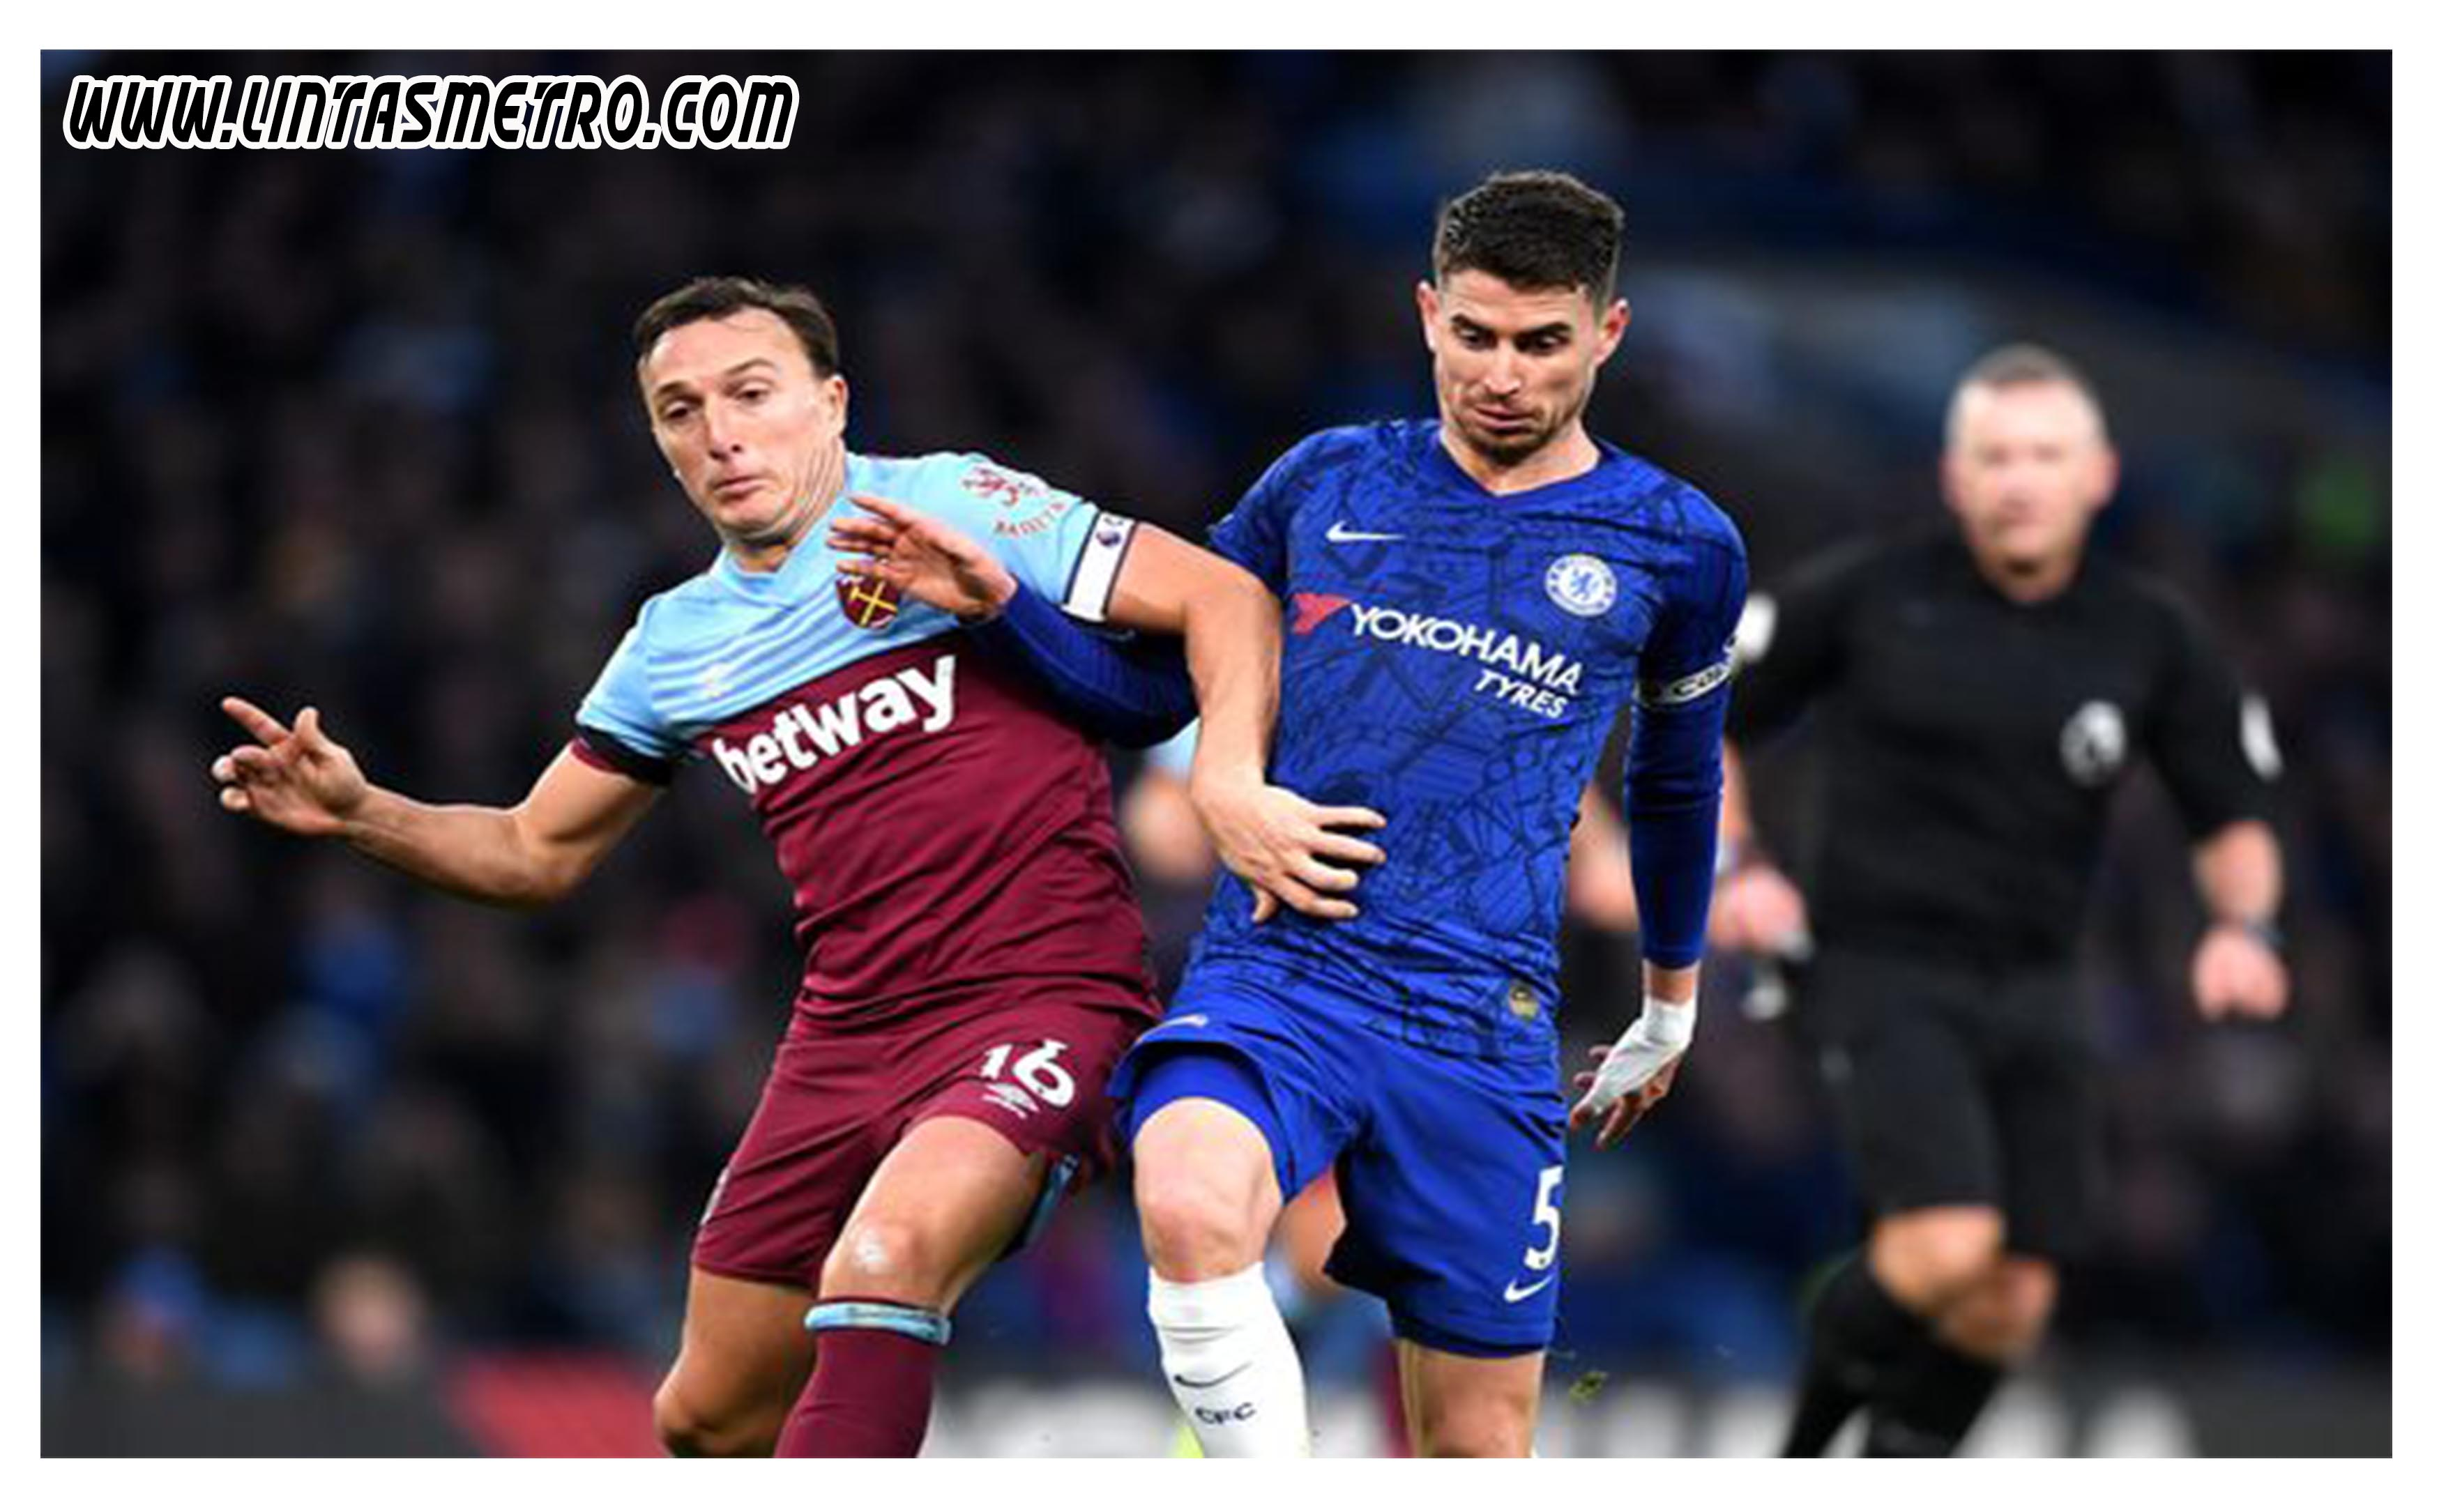 Chelsea vs WestHam United Prediksi Liga Inggris 2020/21